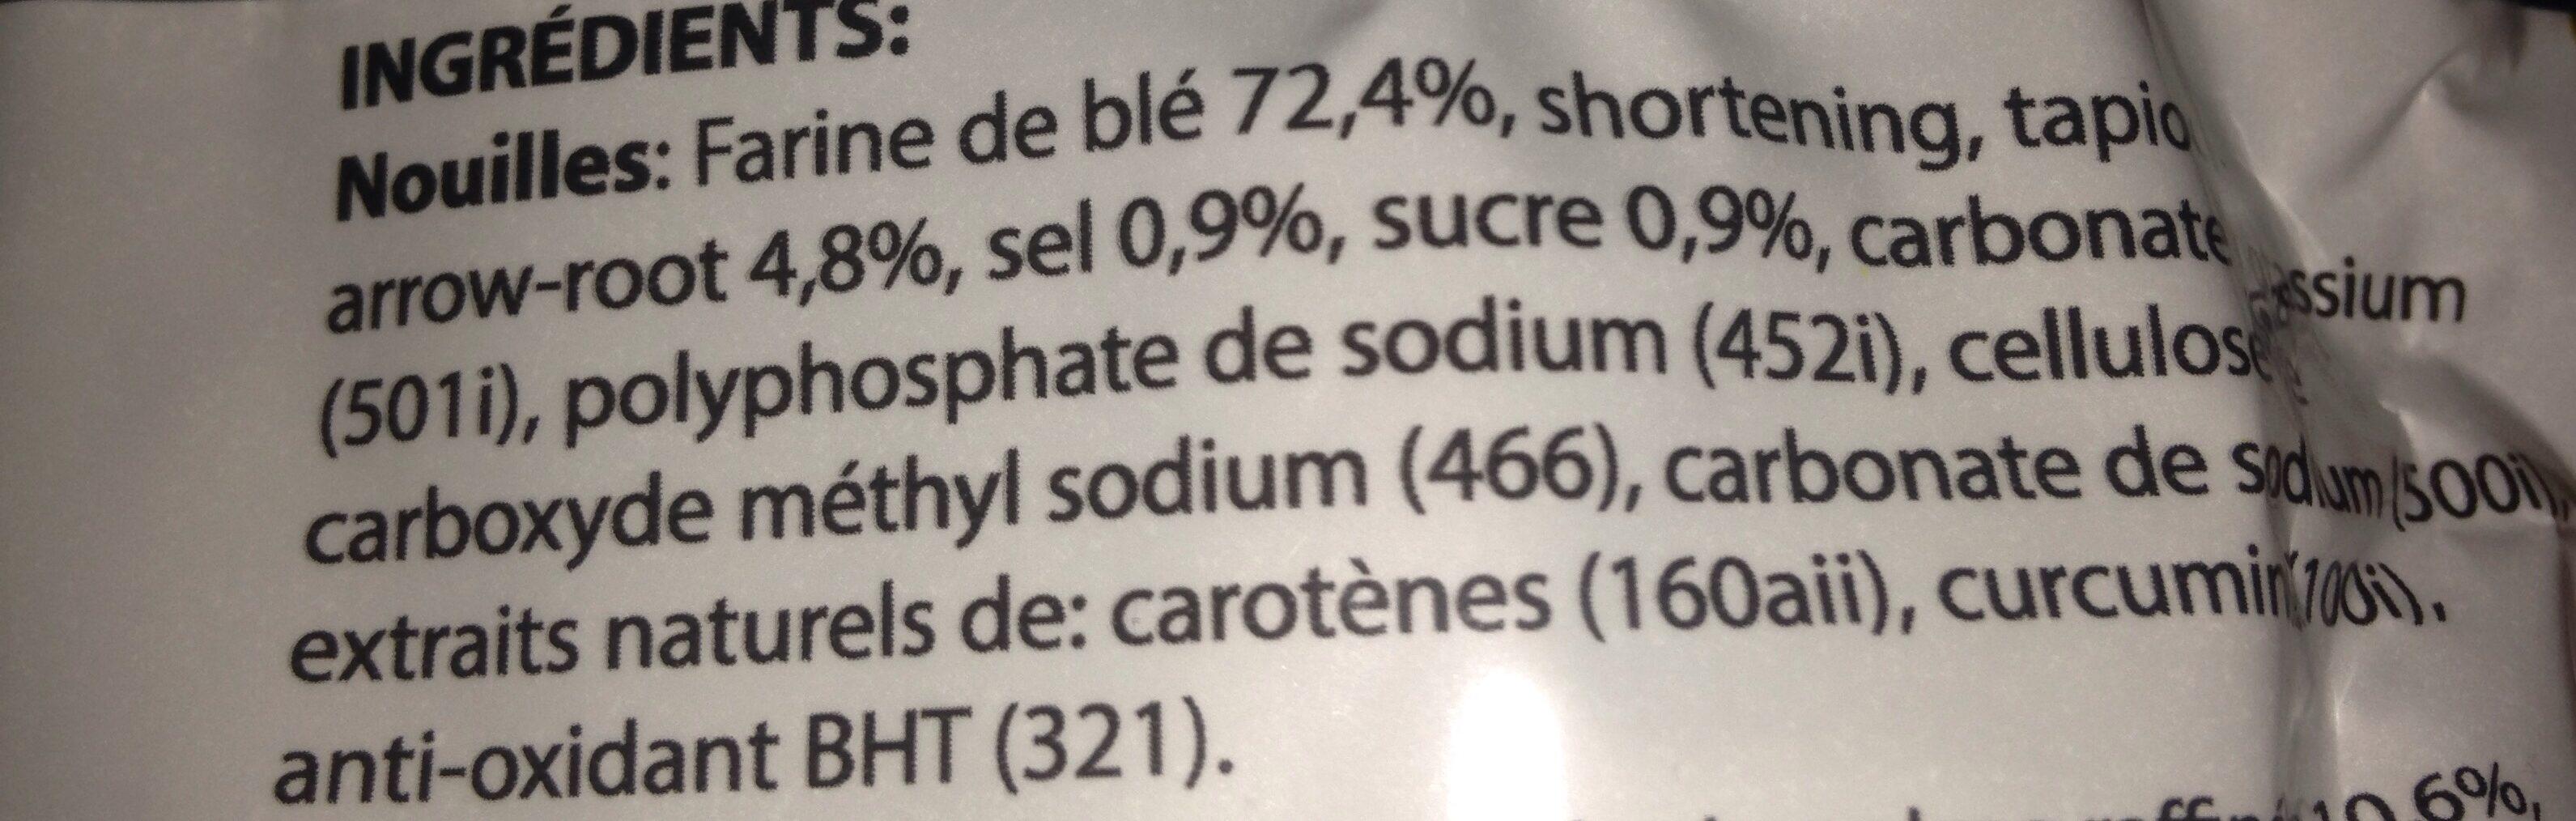 Nouilles Chinoises (Haricots Mungo) (Cellophane ou de Riz Long) - Ingrediënten